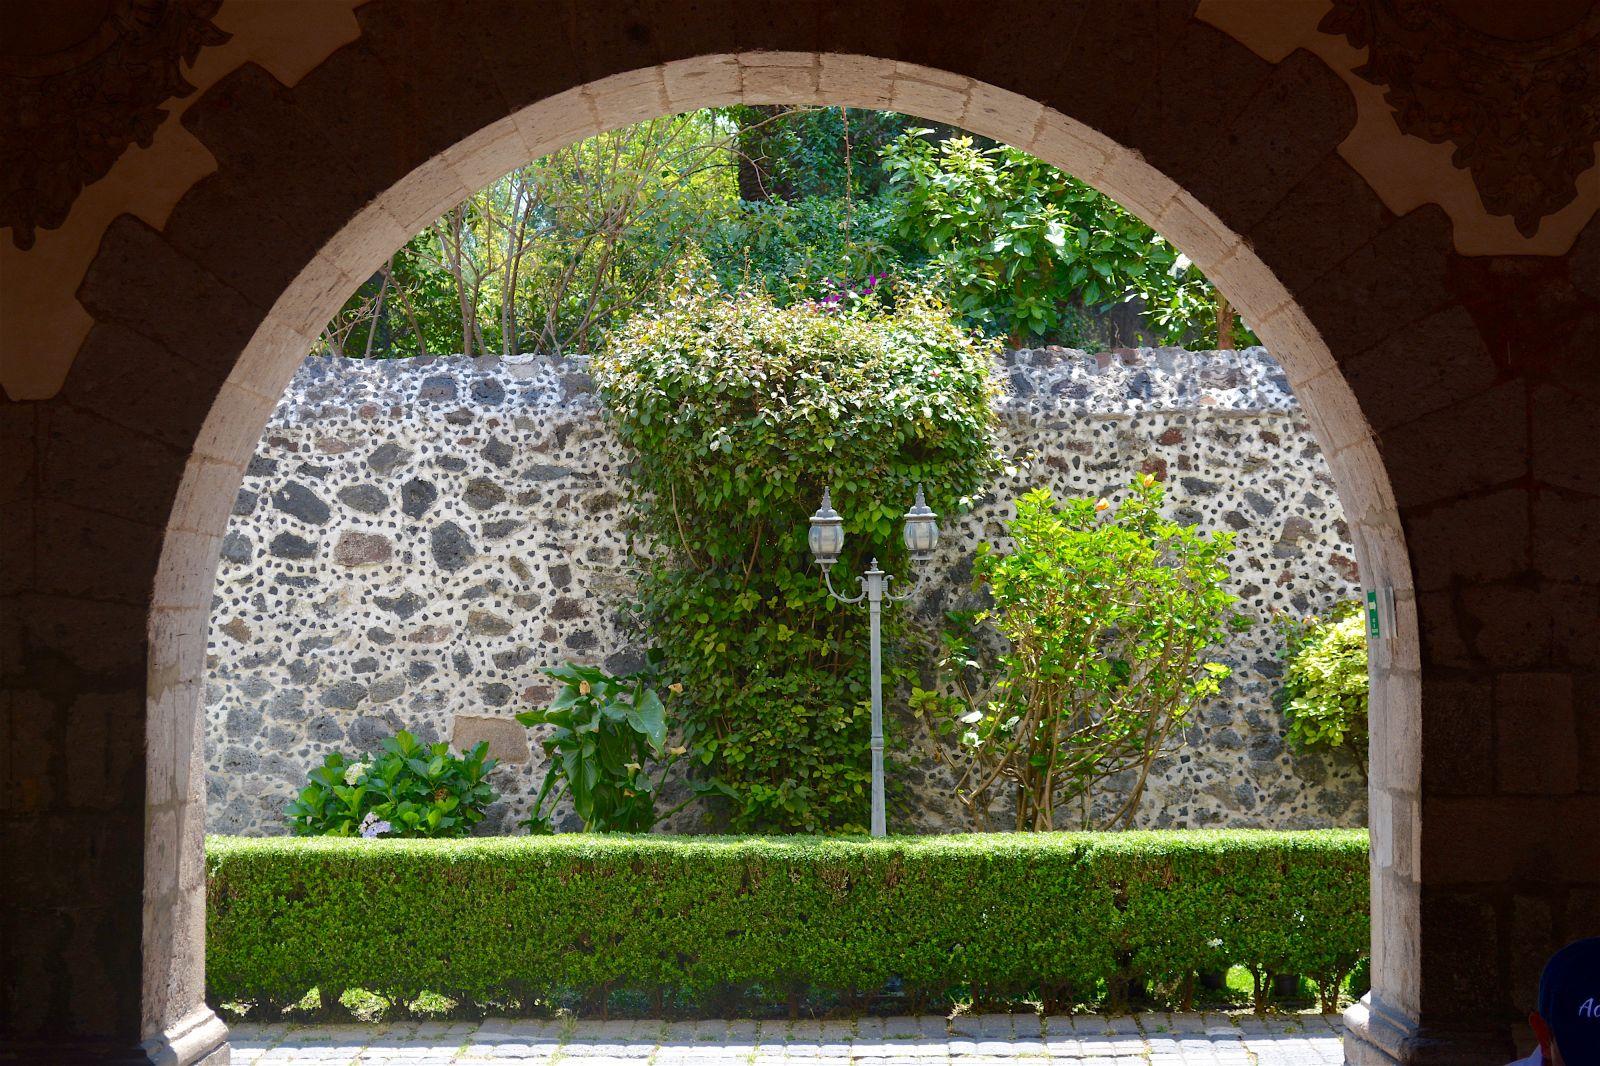 coyoacan-garden-view-intervention-museum